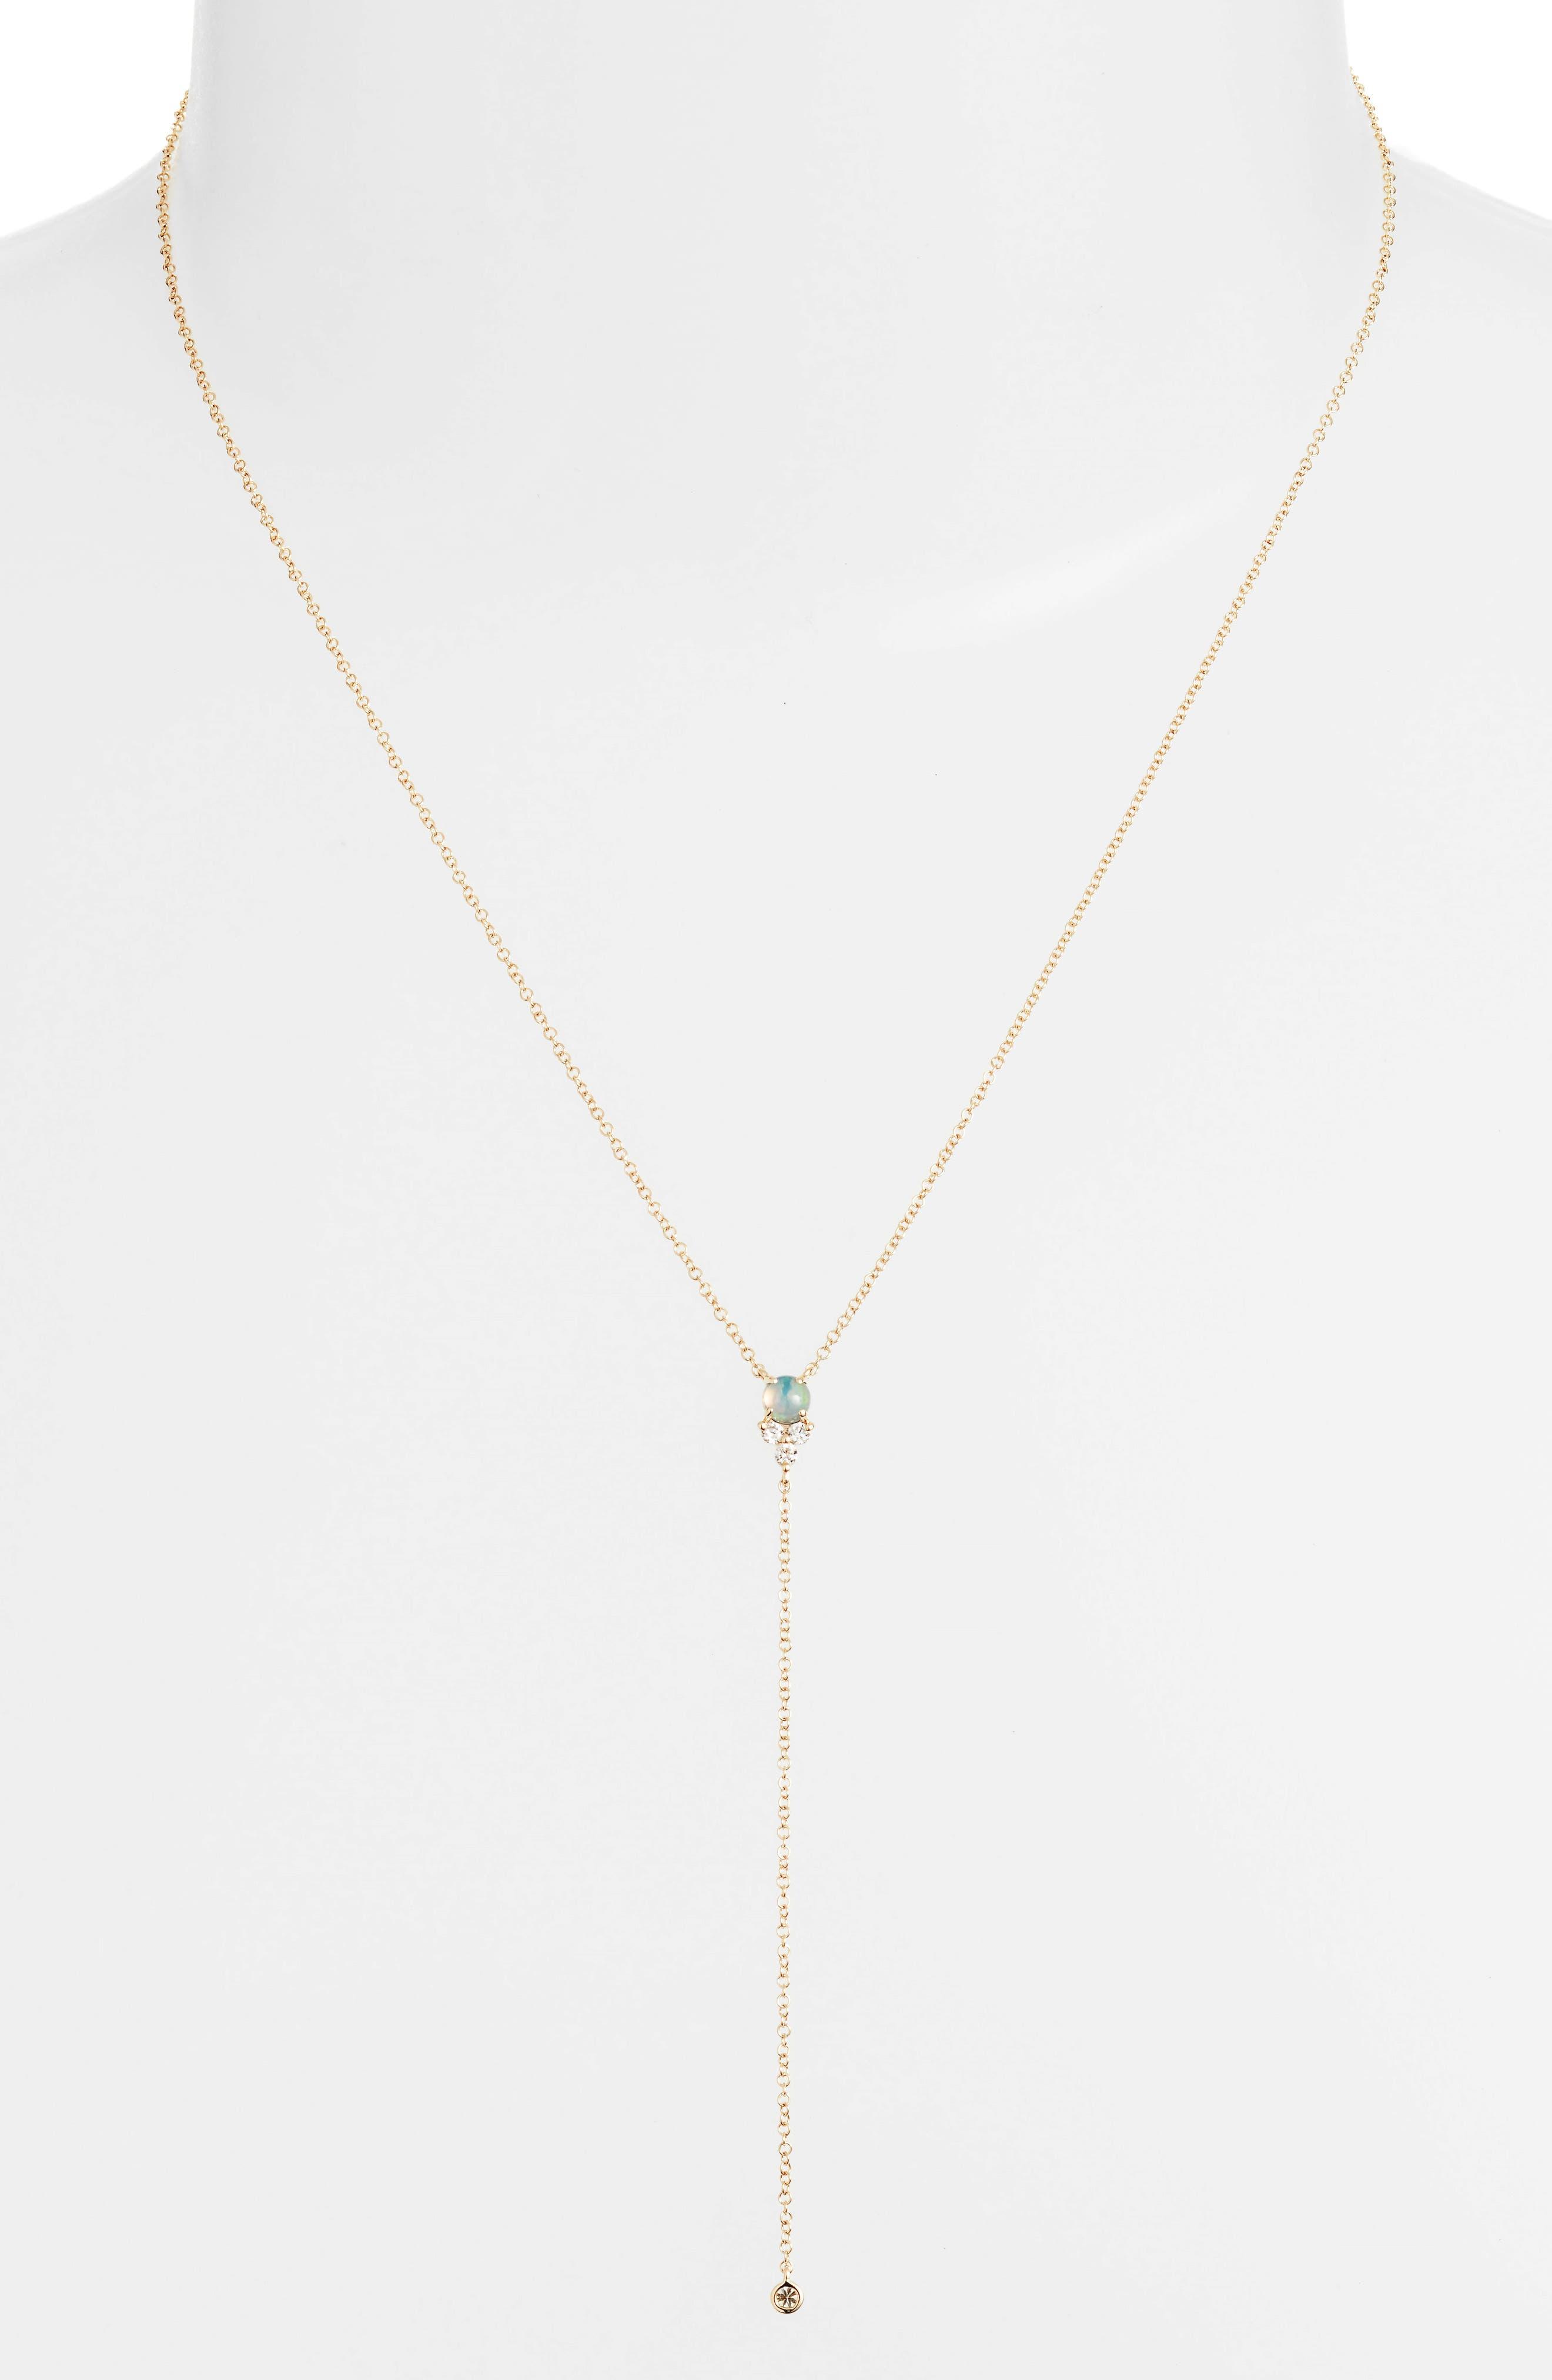 Diamond Trio Stone Lariat Necklace,                             Alternate thumbnail 2, color,                             YELLOW GOLD/ OPAL